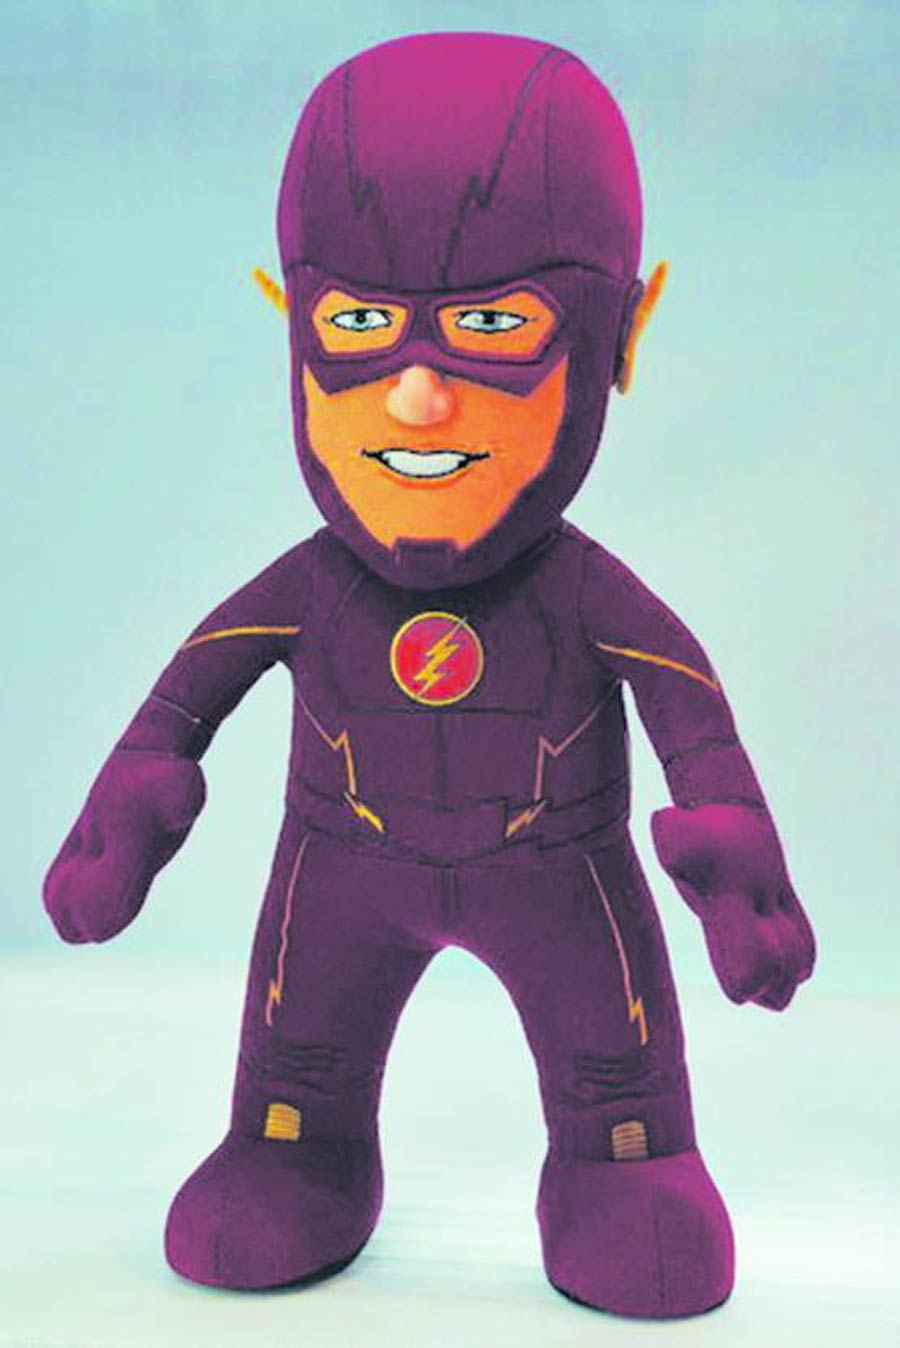 Bleacher Creatures DC TV-Verse 10-Inch Plush - Flash